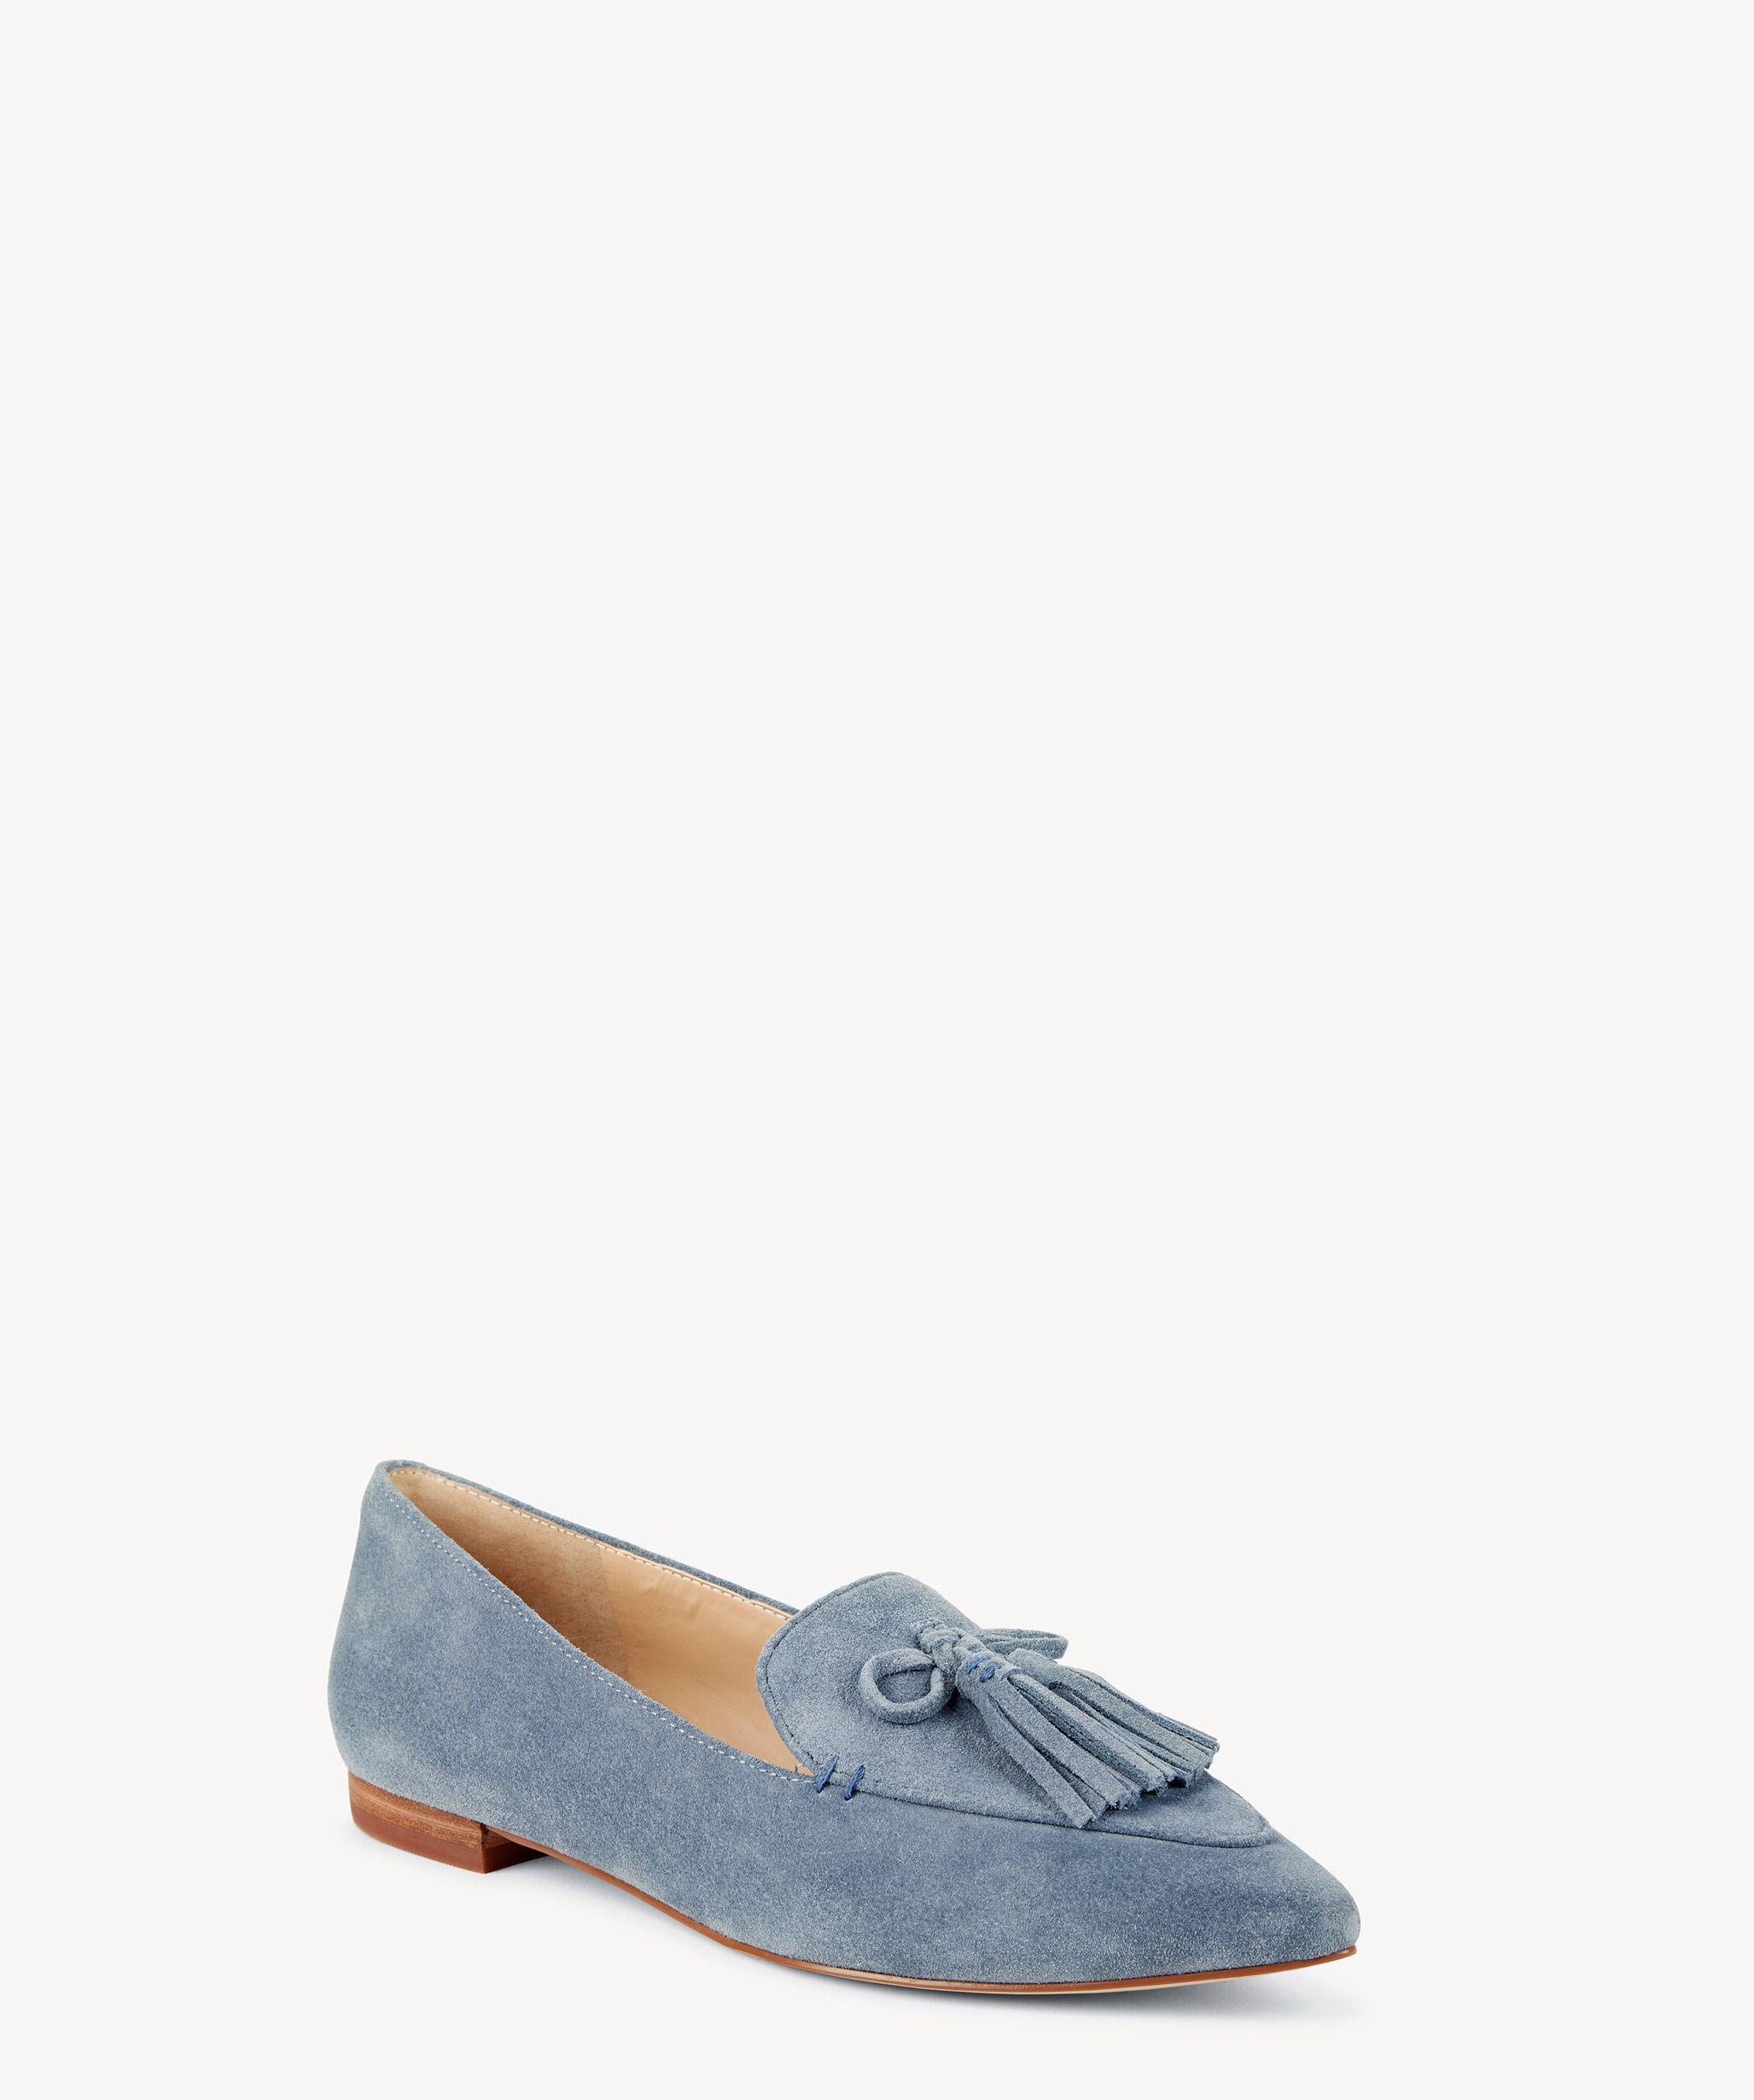 4f1c92b2941 Lyst - Sole Society Hadlee Tassel Loafer in Blue